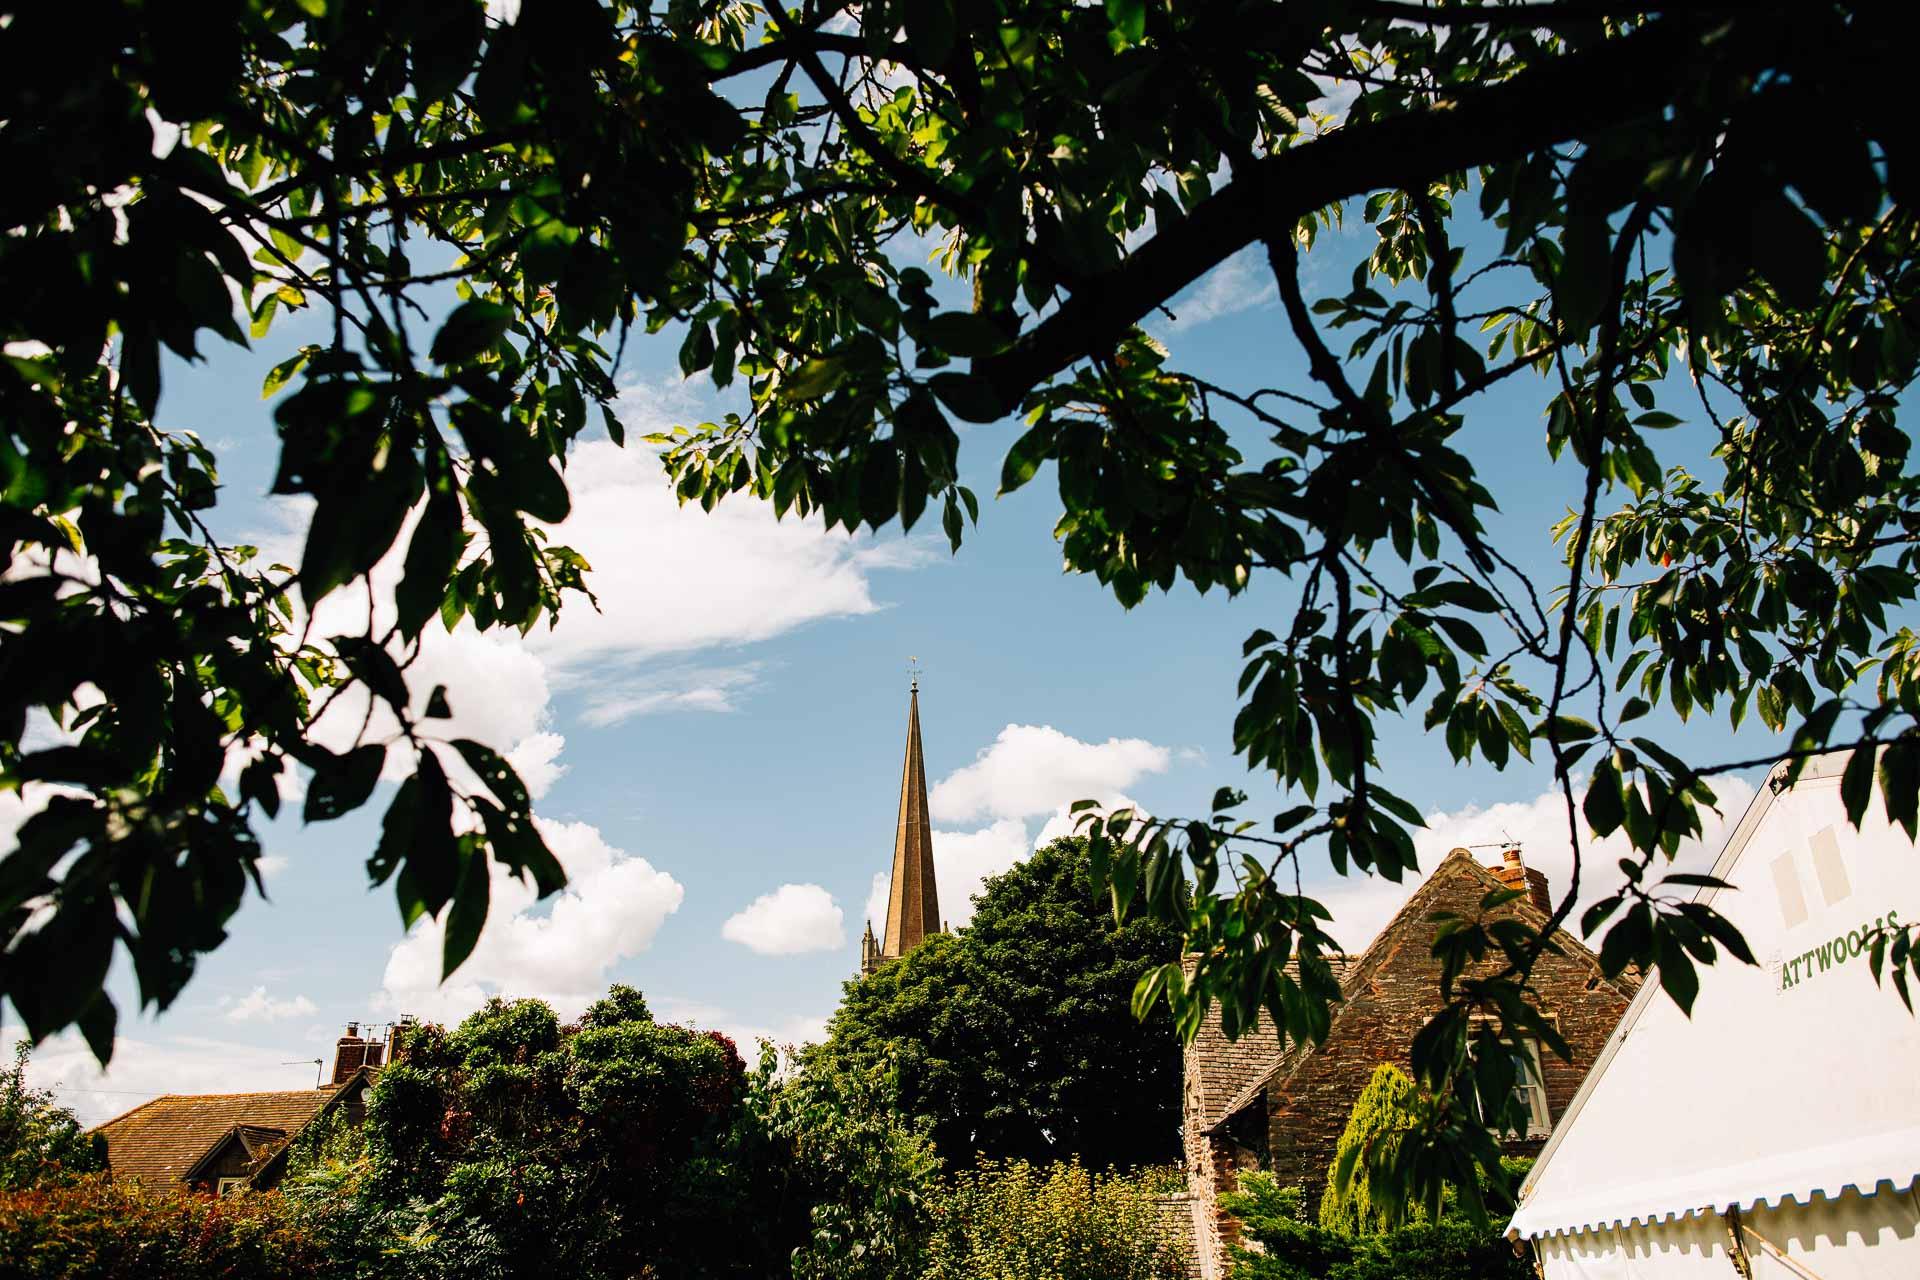 winterbourne-medieval-barn-wedding-photography-emma-andrew-17